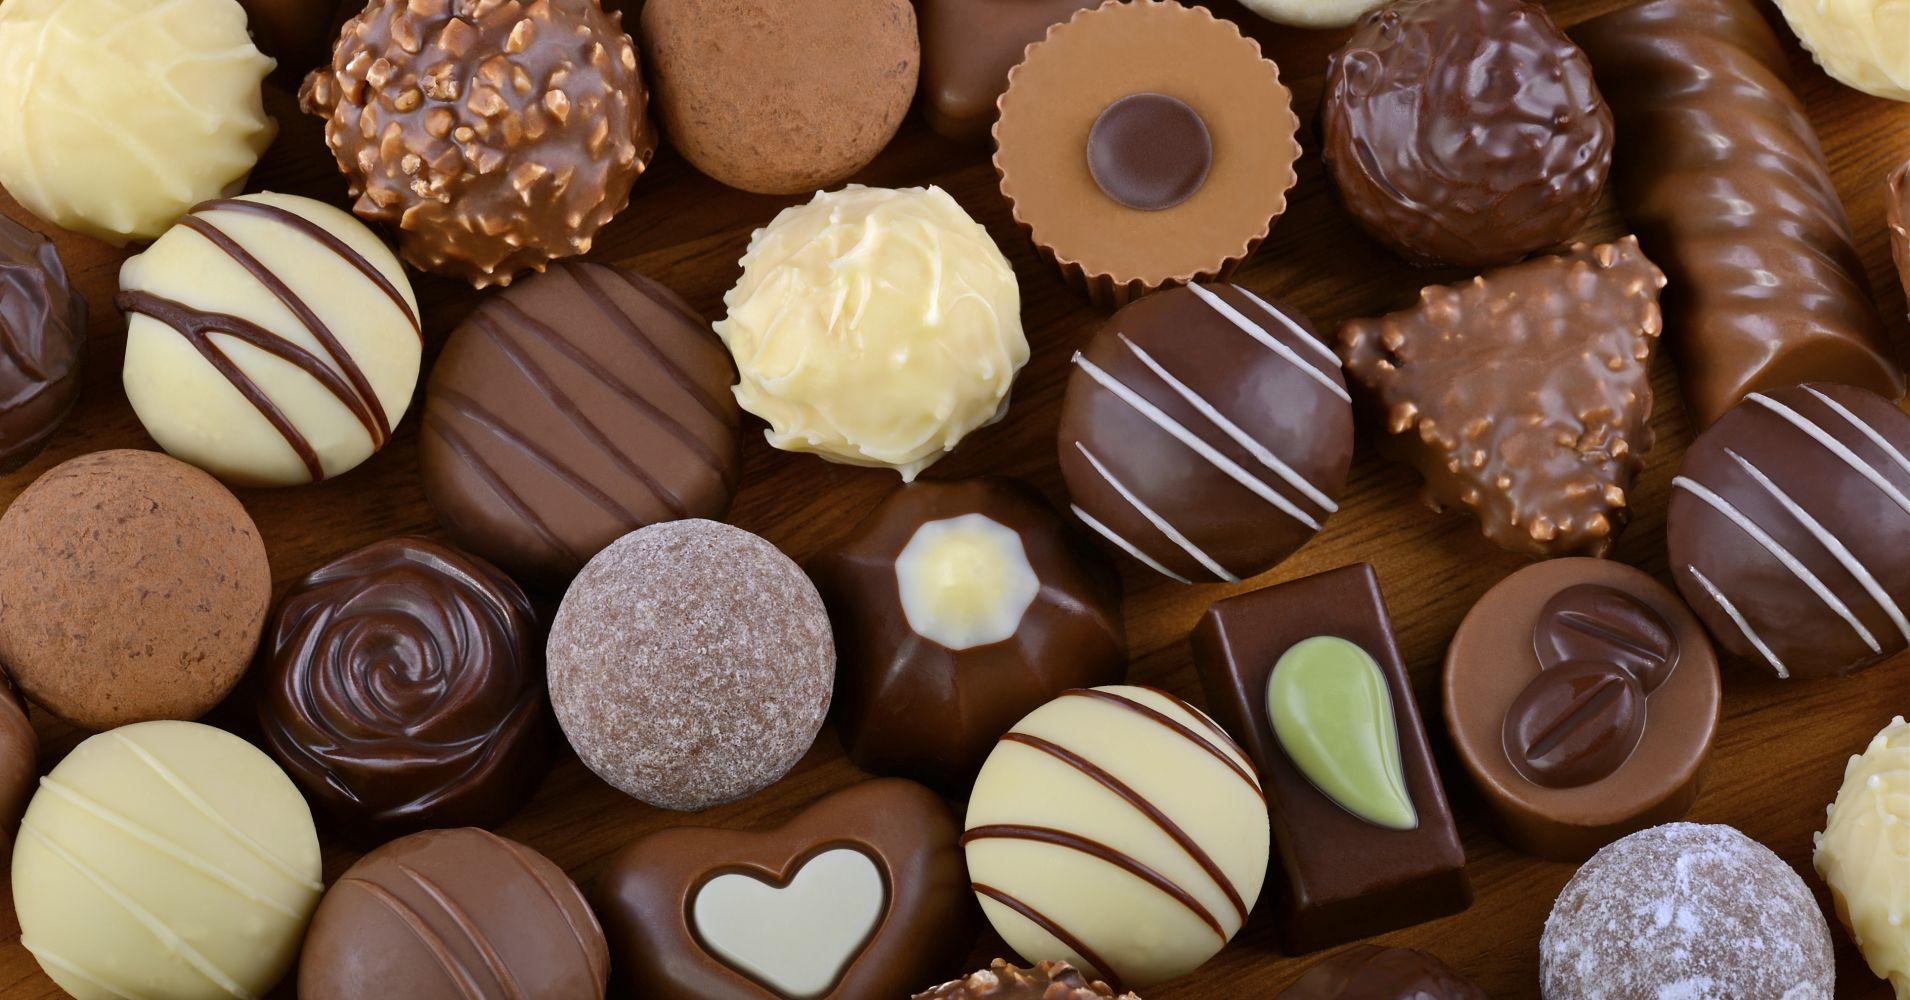 Good chocolate